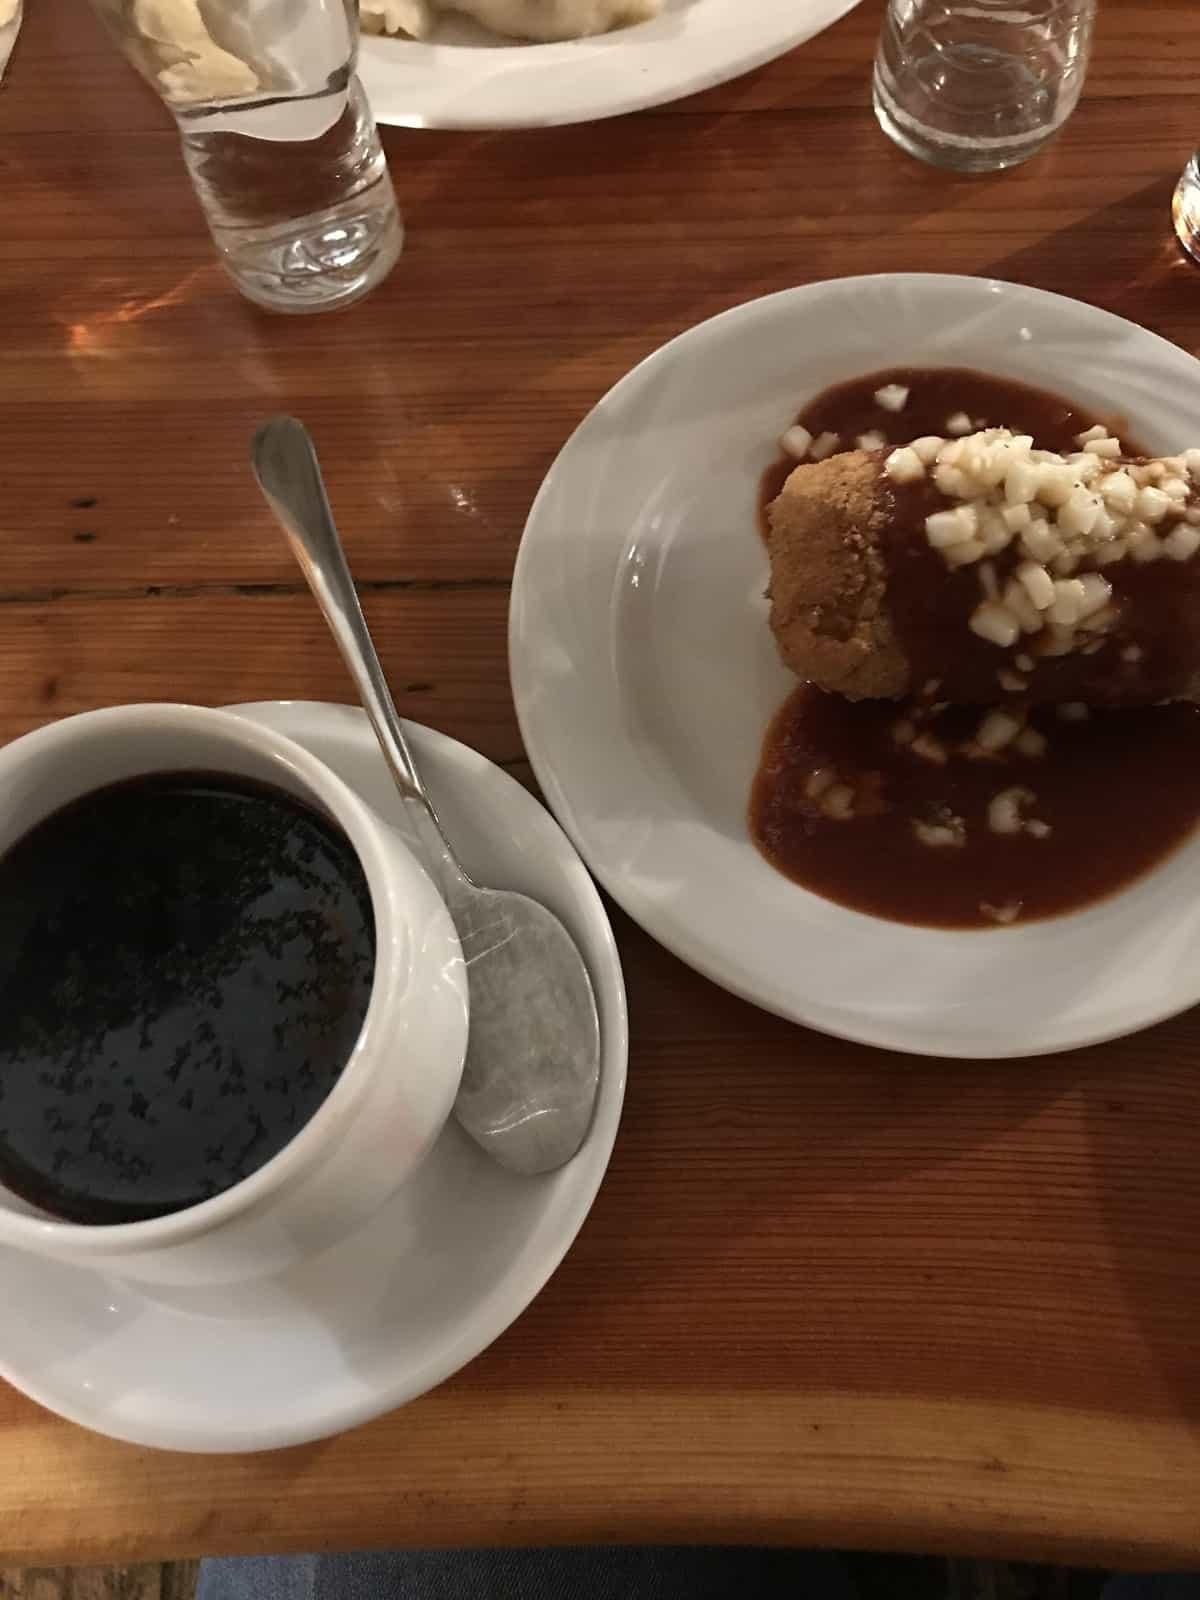 Borsht soup at U Babci Maliny restaurant in Krakow, Poland